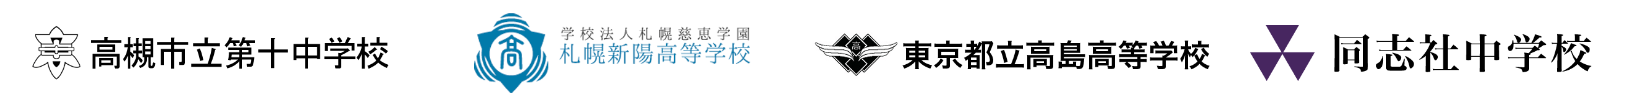 logolist